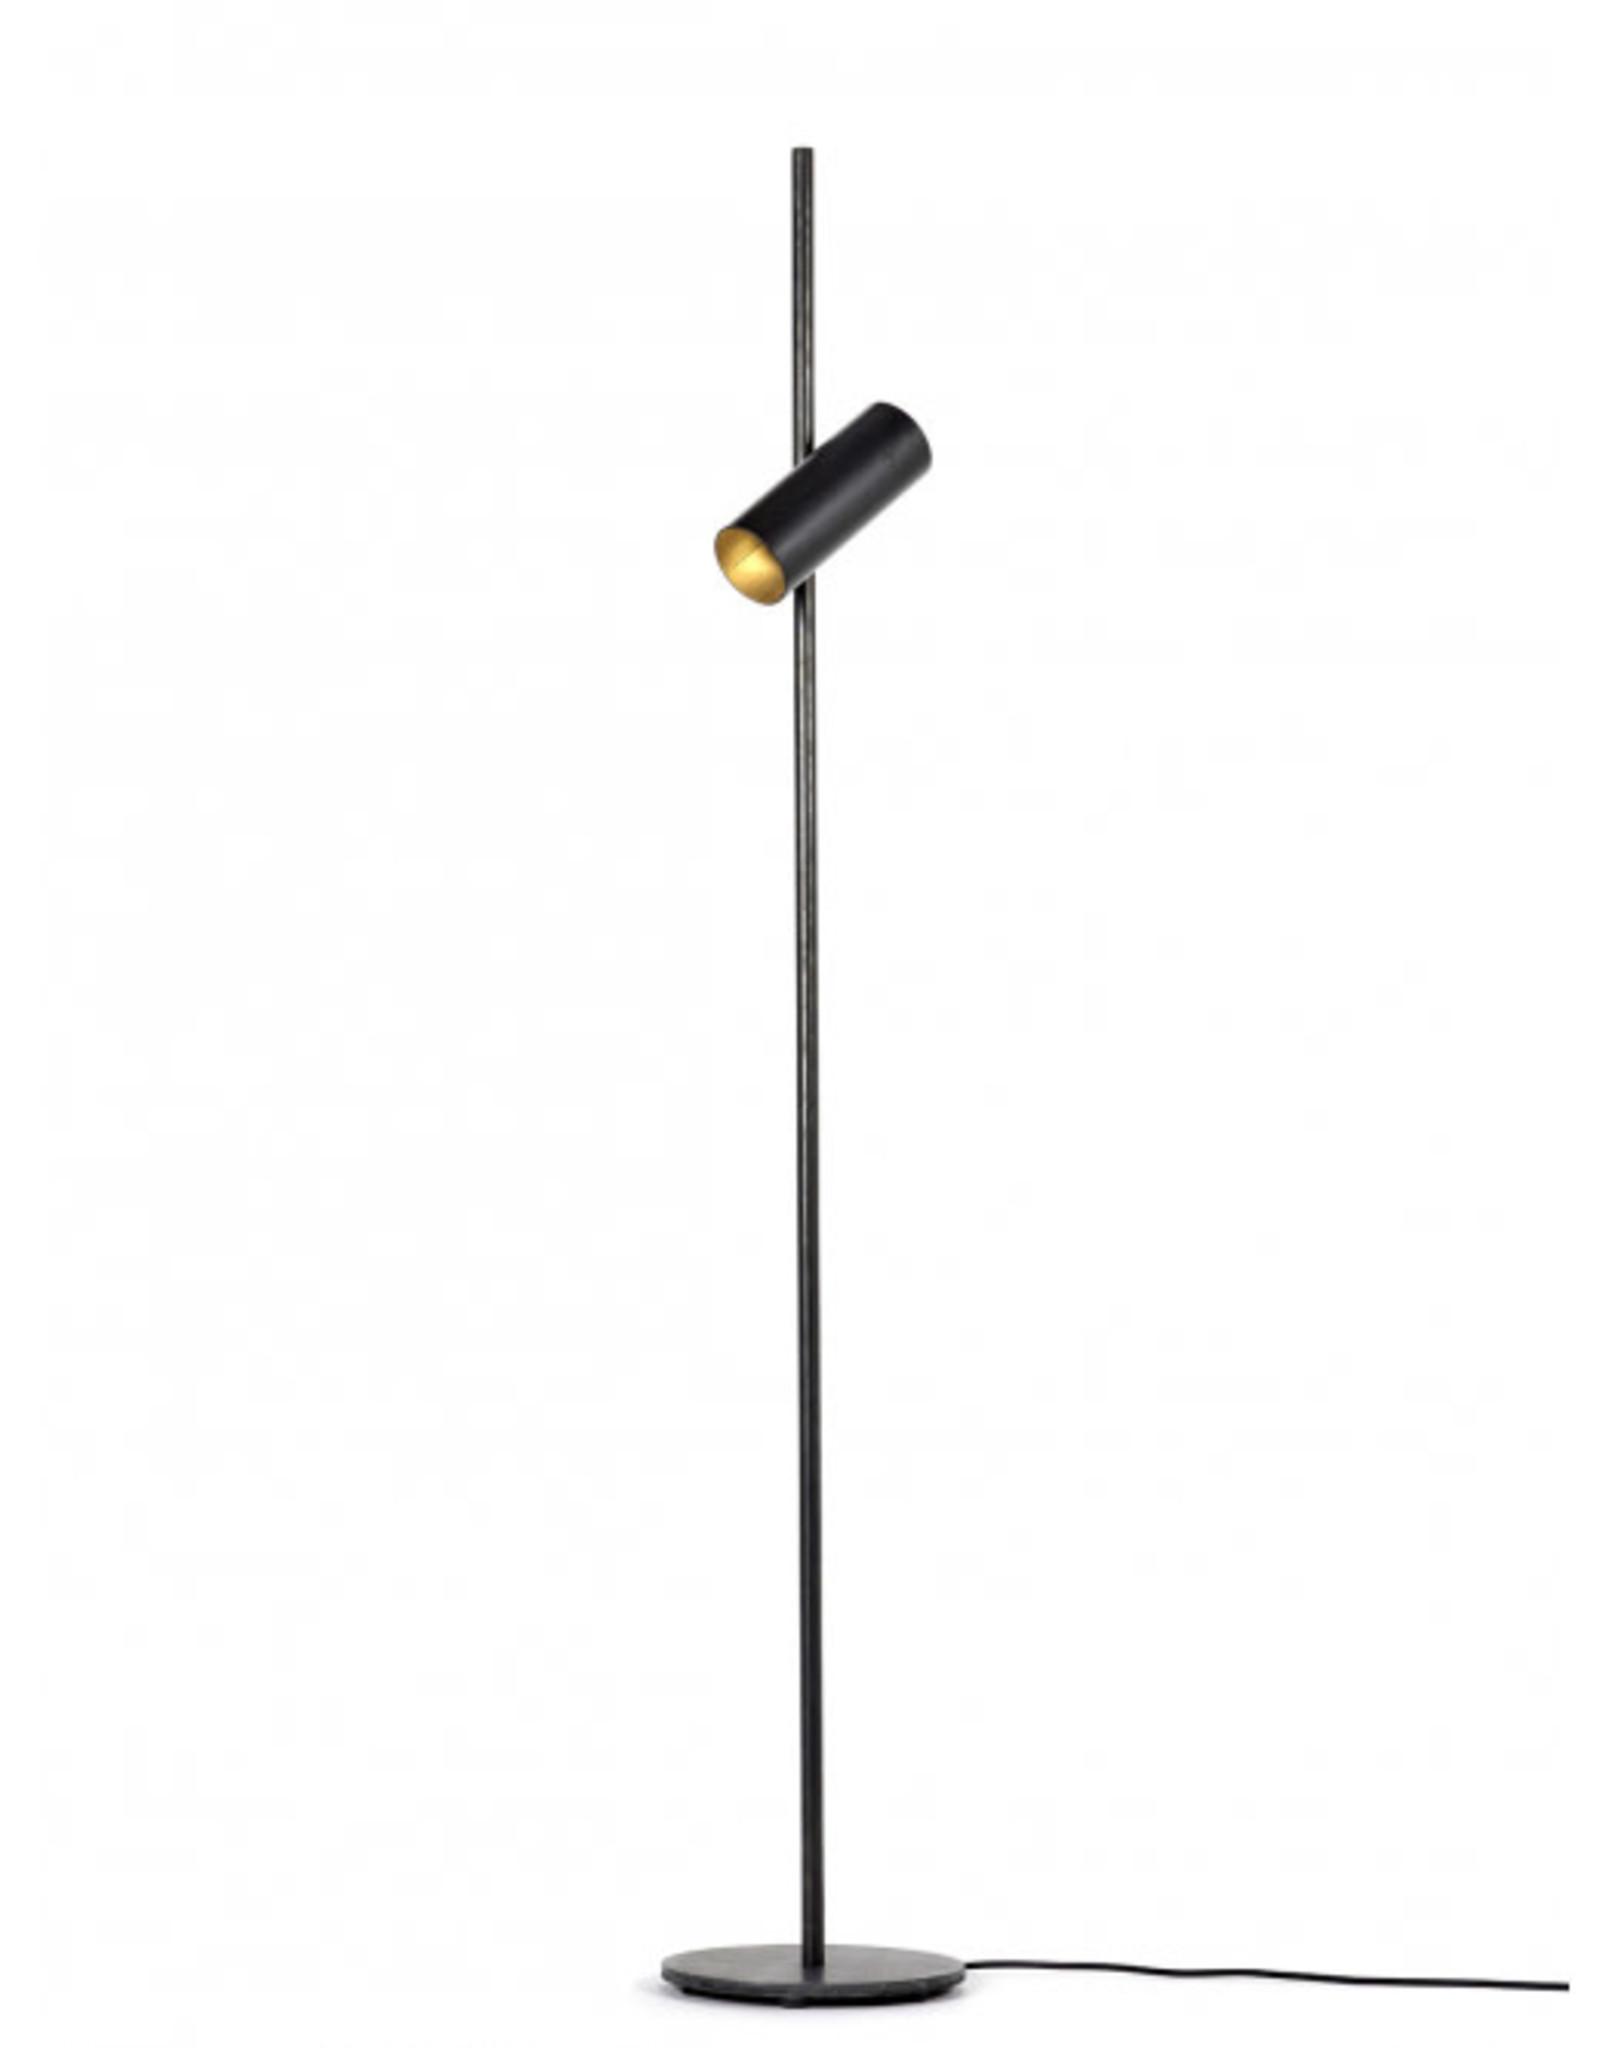 Serax Vloerlamp nr. 15 Sofisticato